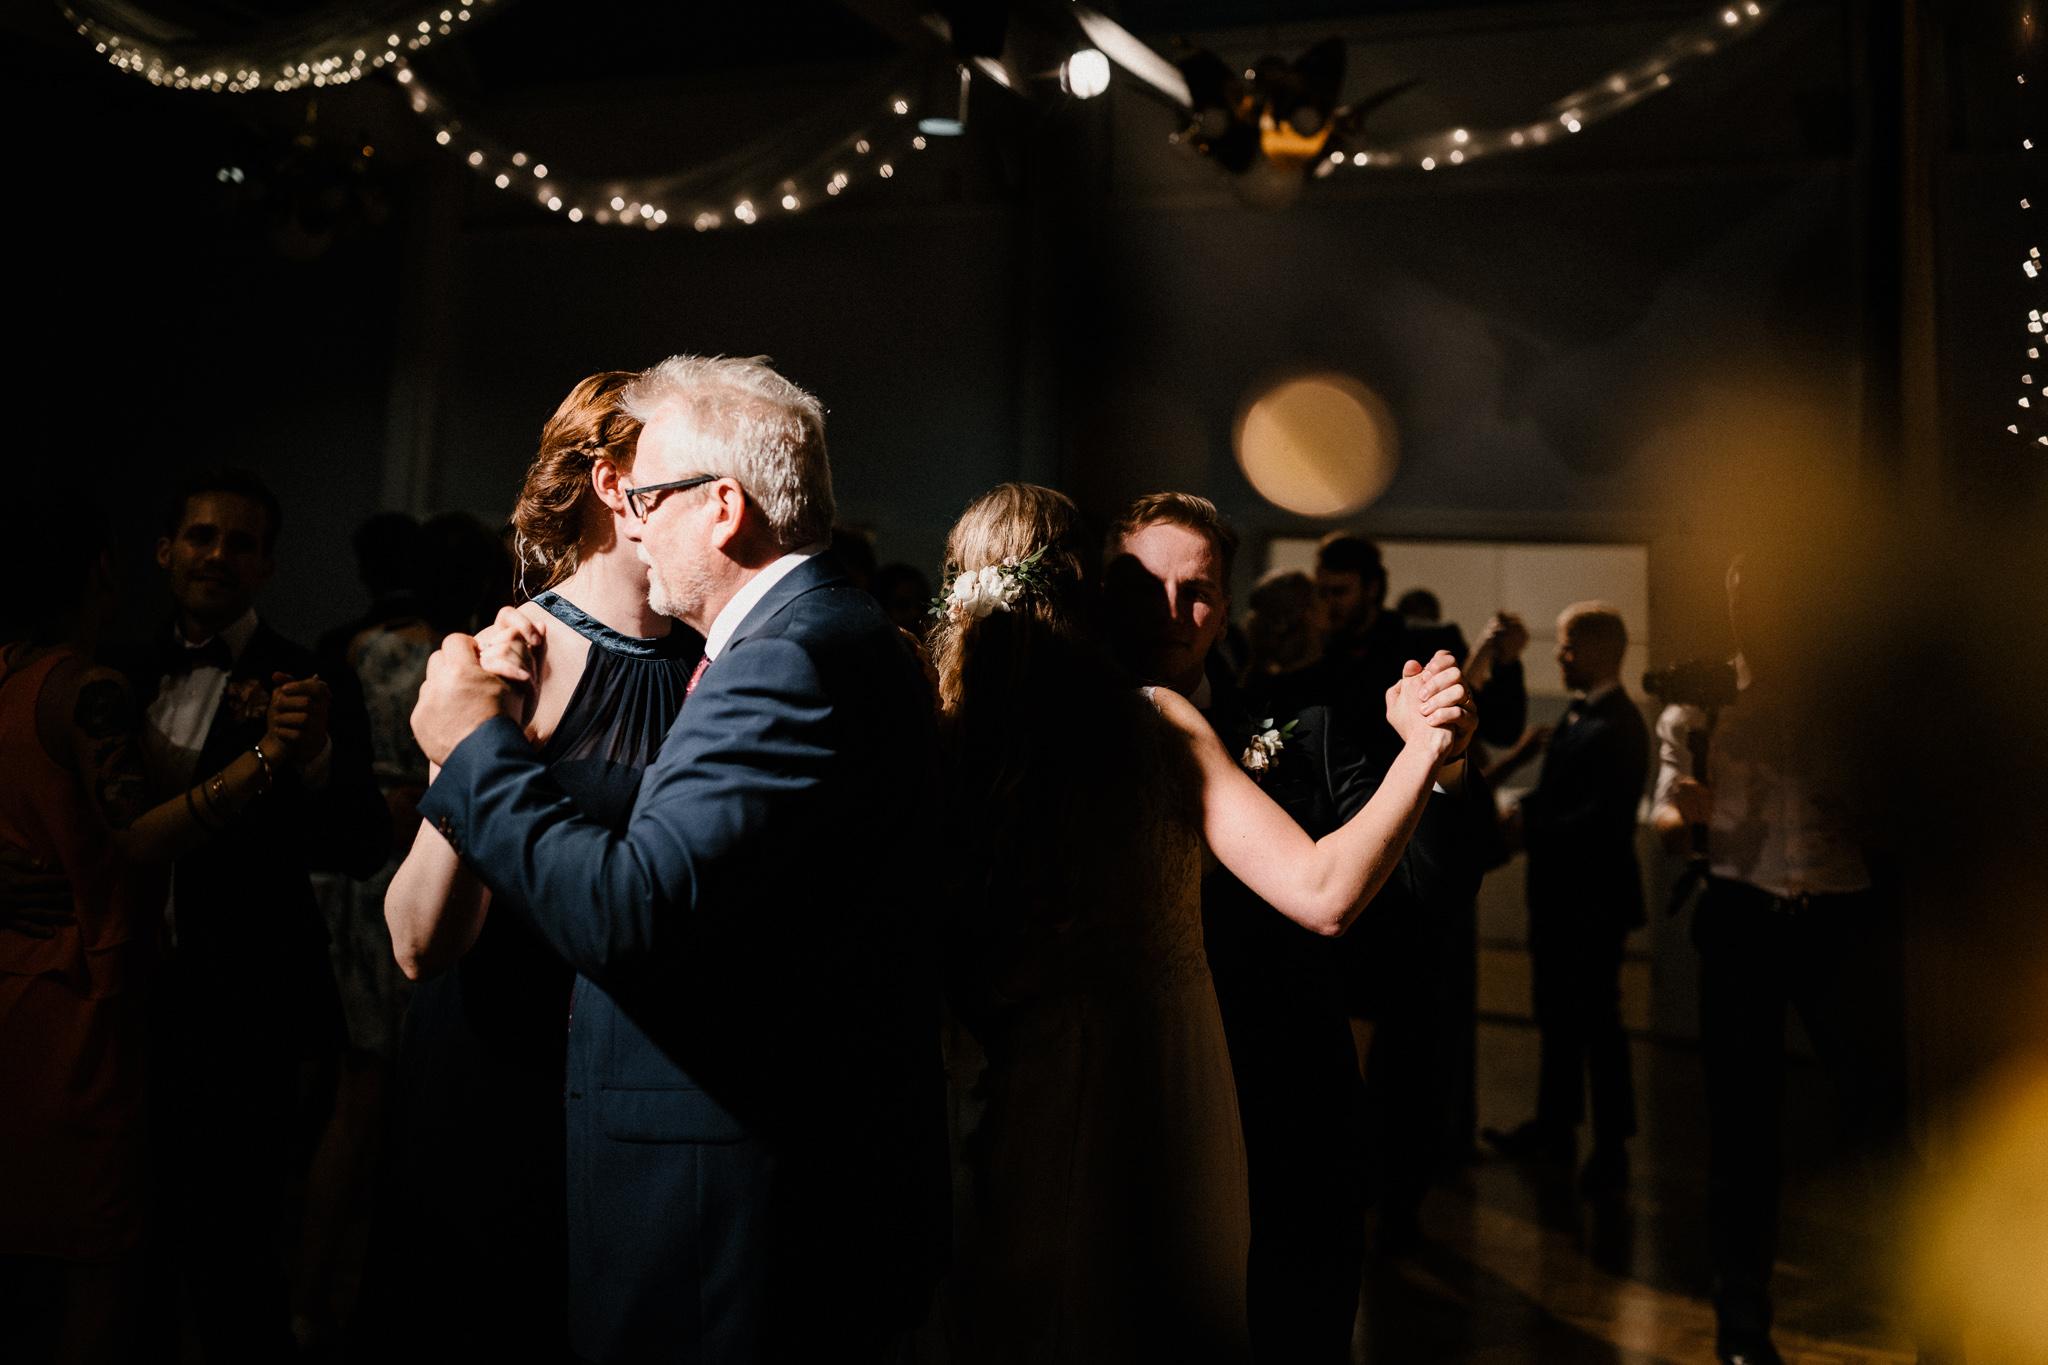 Johanna + Mikko - Tampere - Photo by Patrick Karkkolainen Wedding Photographer-195.jpg